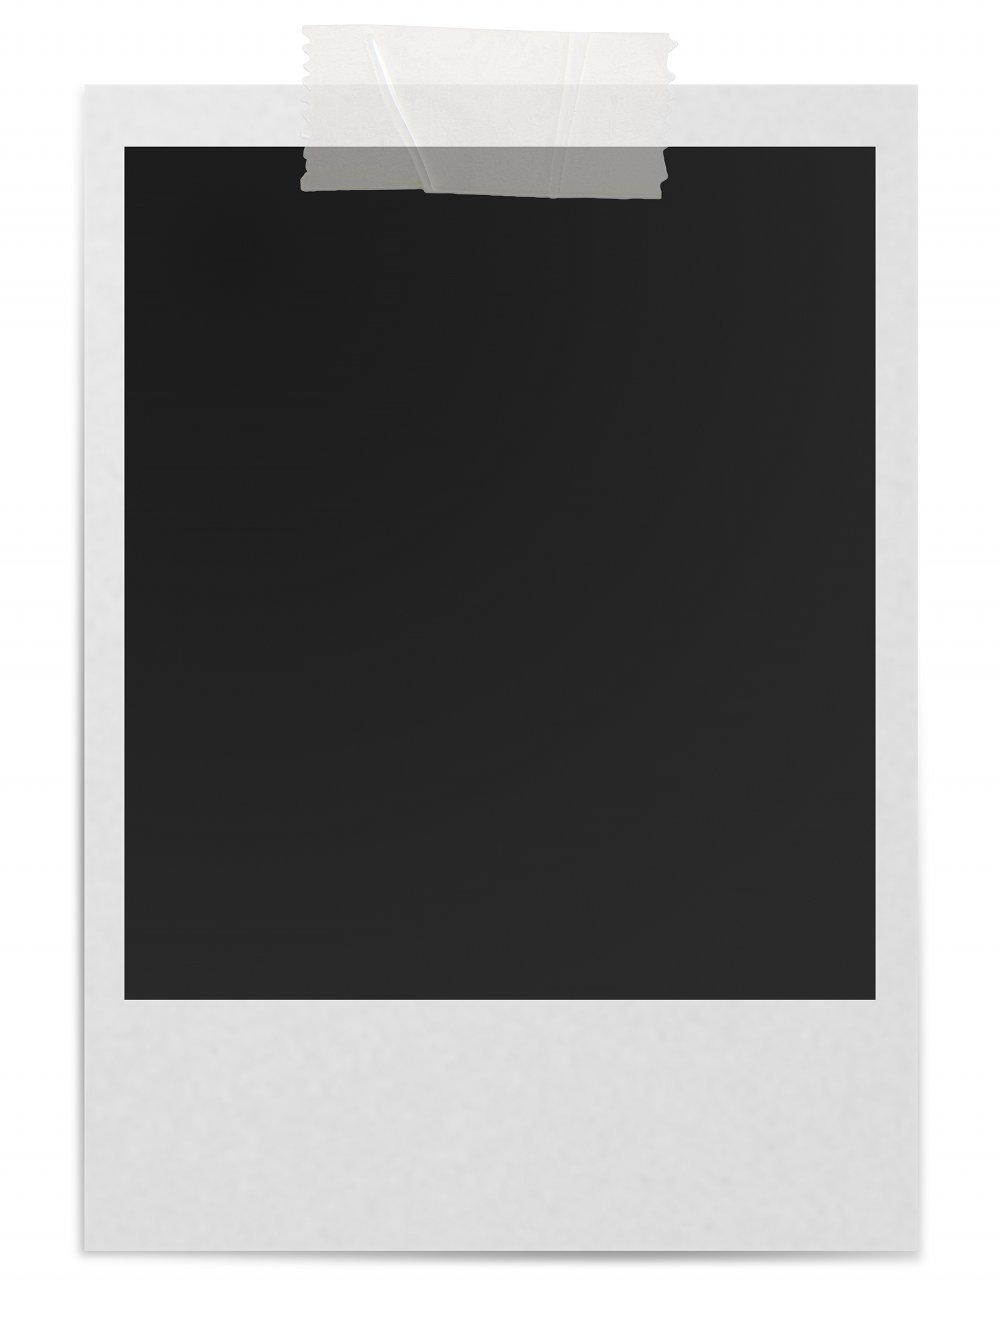 bit cora de jesusda tutorial gimp fotograf as al estilo polaroid. Black Bedroom Furniture Sets. Home Design Ideas